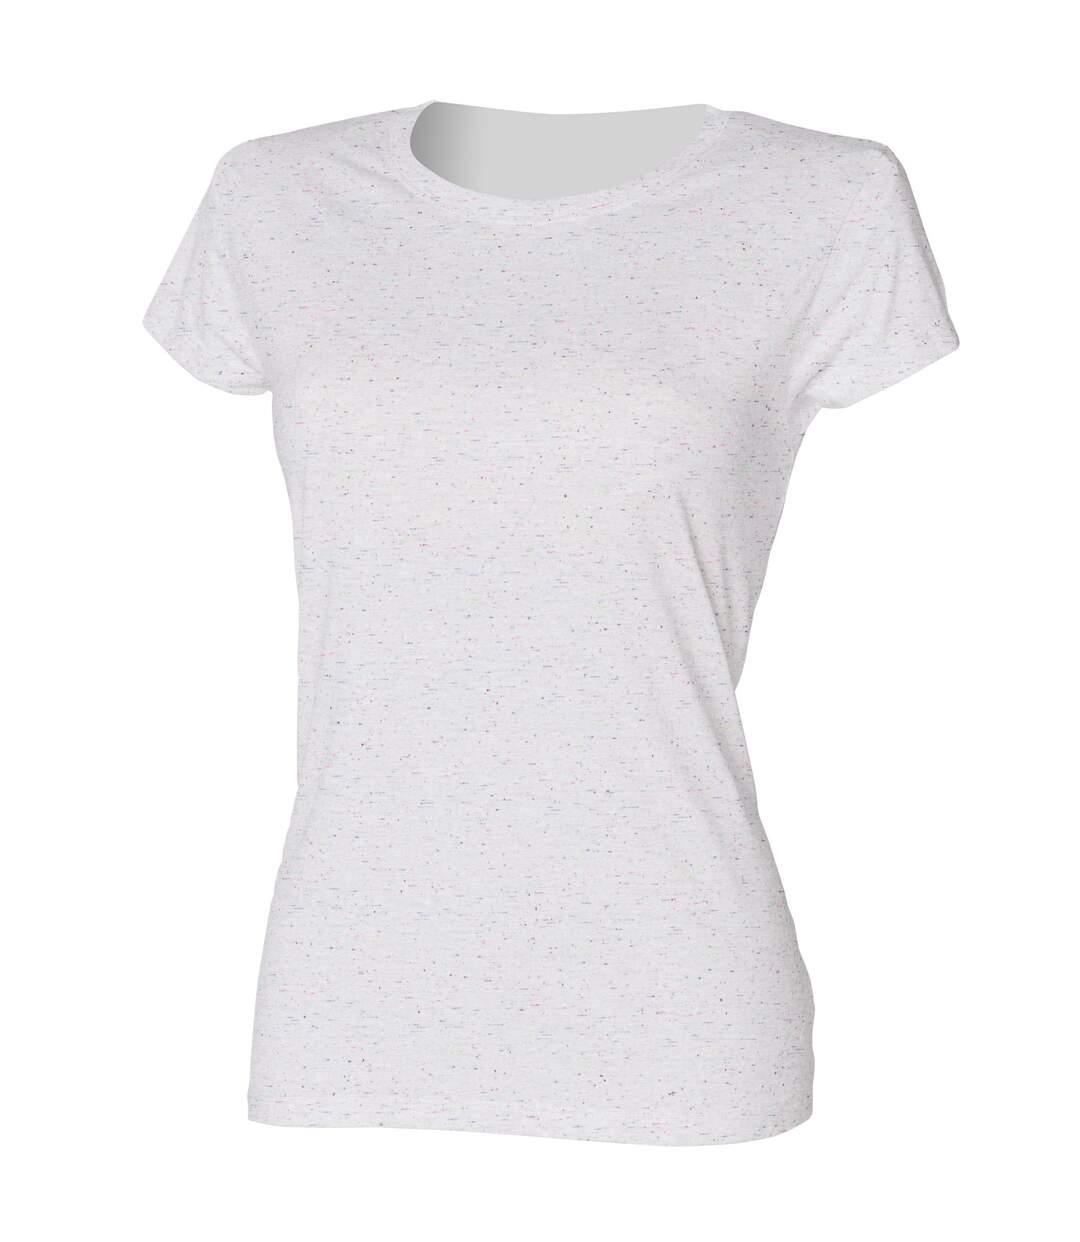 Skinni Fit - T-Shirt Moucheté - Femme (Blanc) - UTRW1379